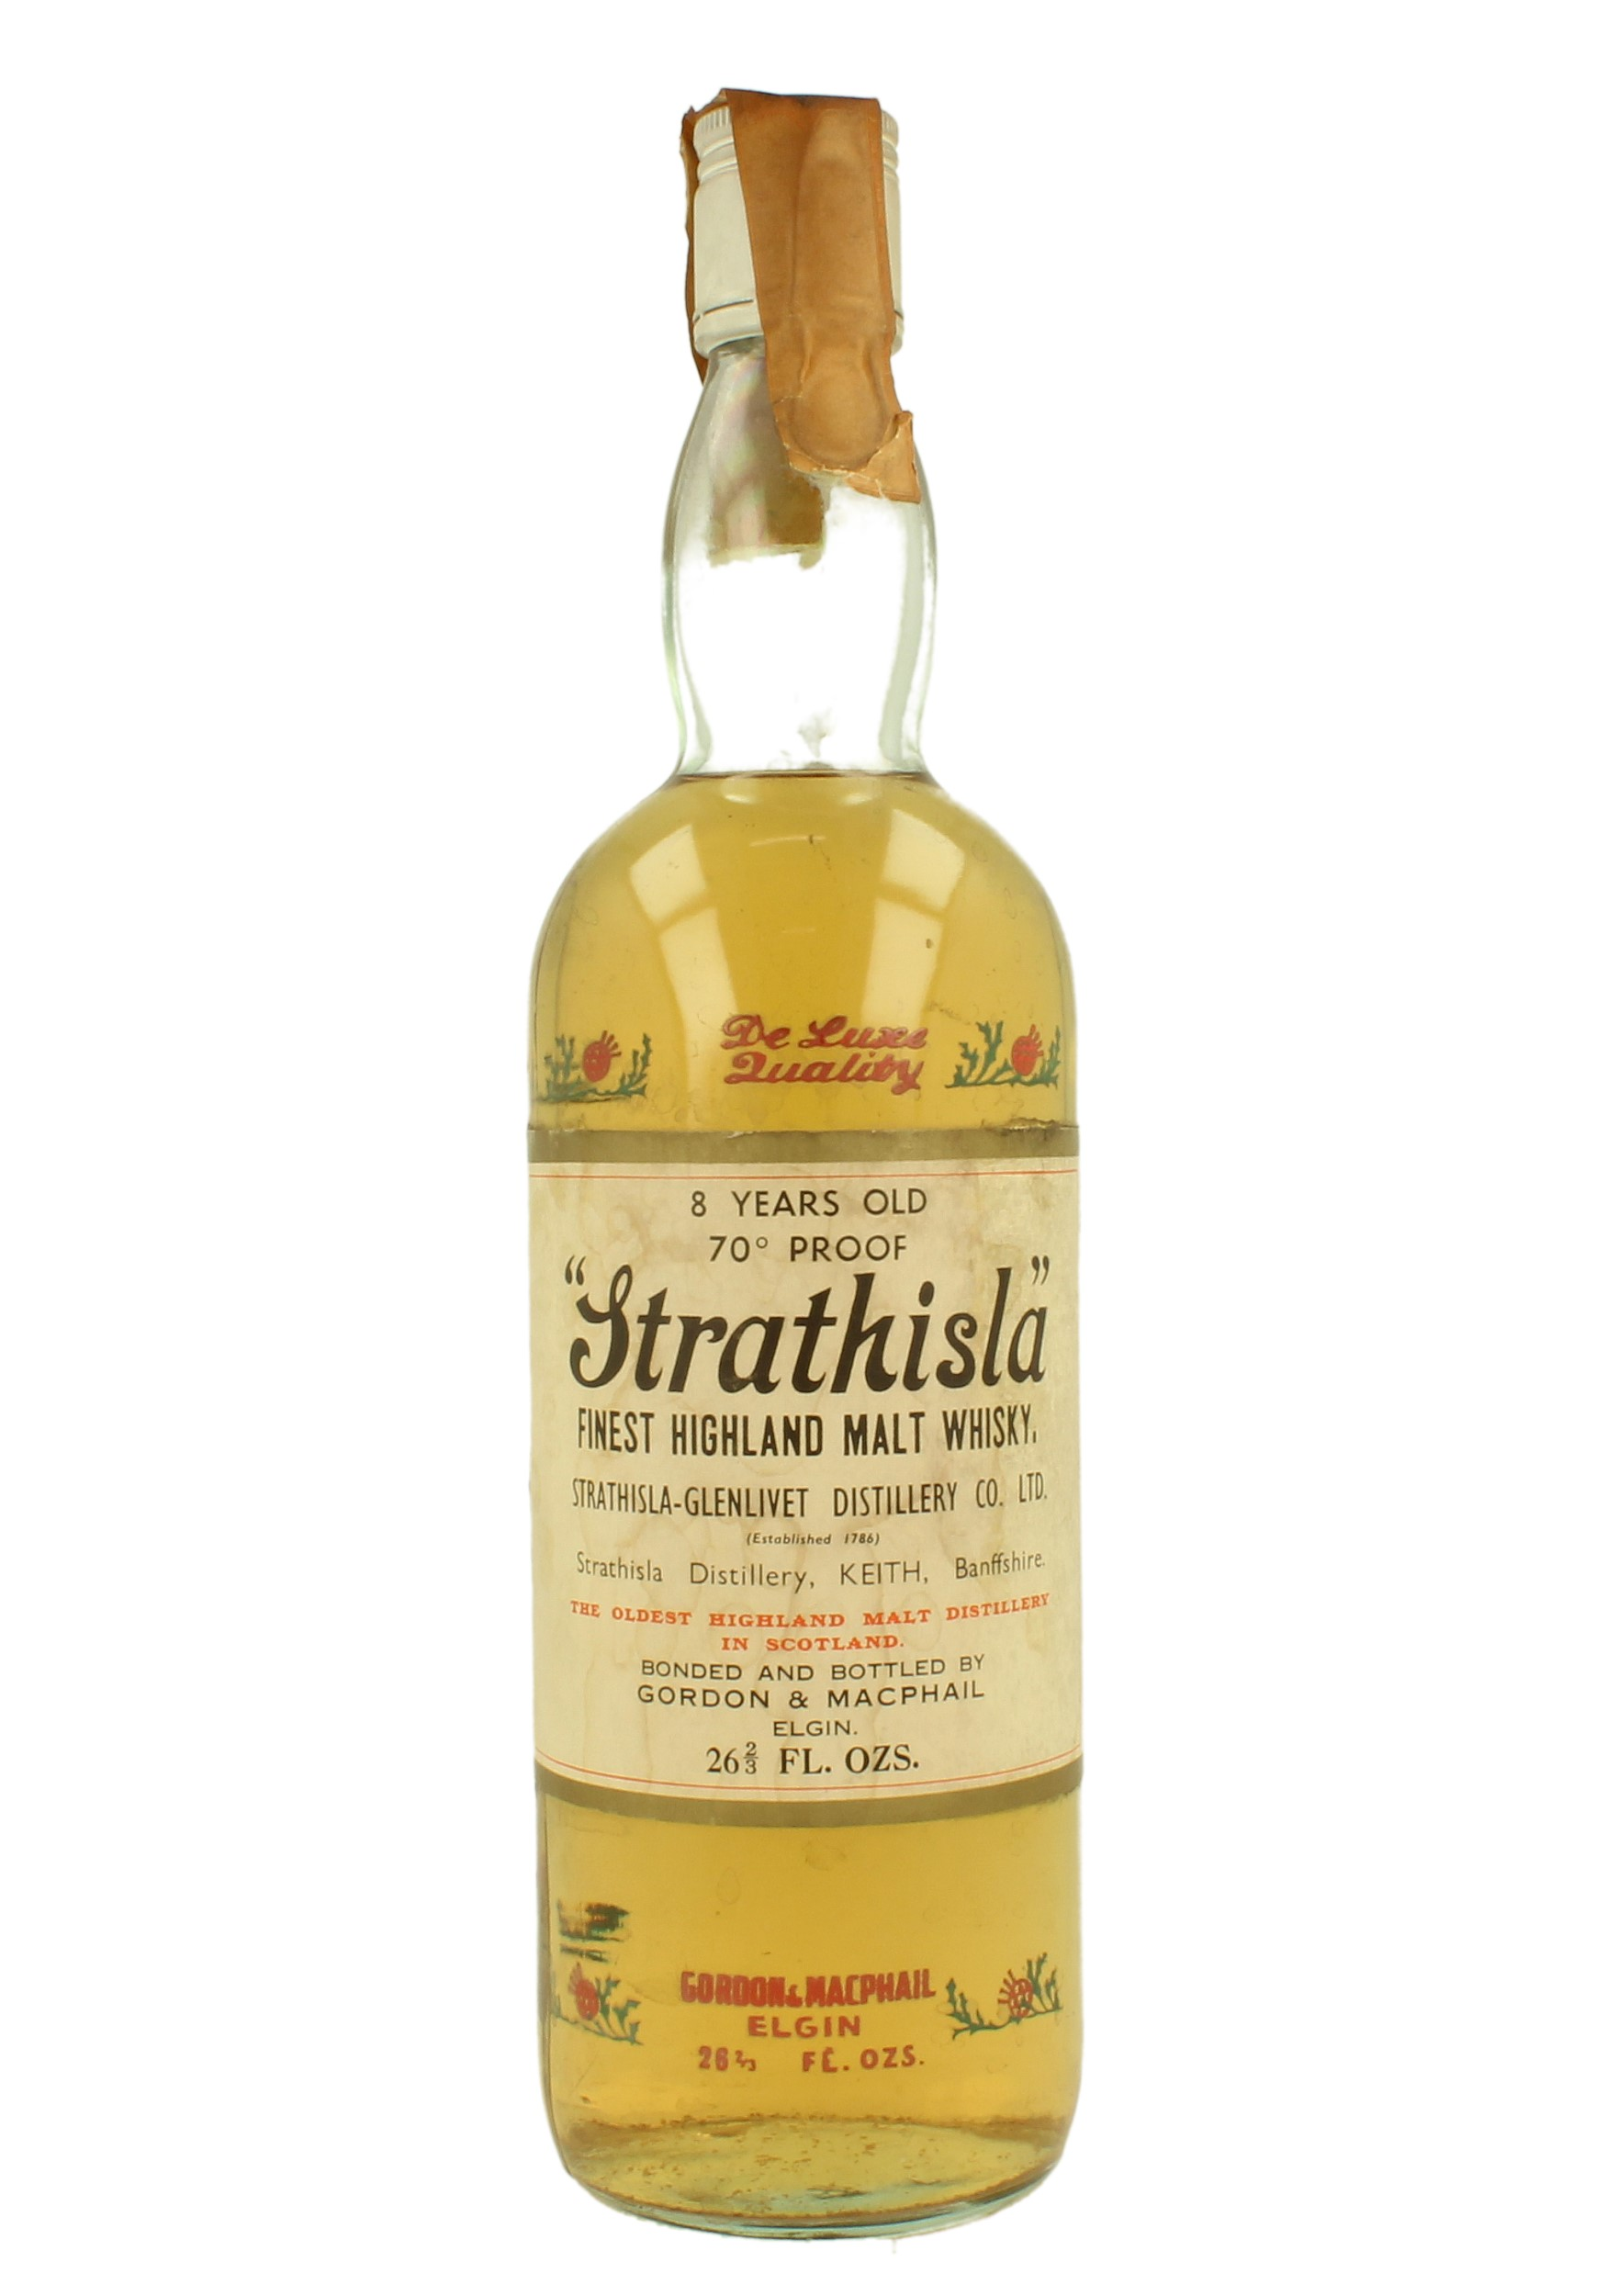 Strathisla 8yo Bot 70 S 26 2 3 Fl Ozs 70 Proof Gordon Macphail Thistle Bottle Products Whisky Antique Whisky Spirits